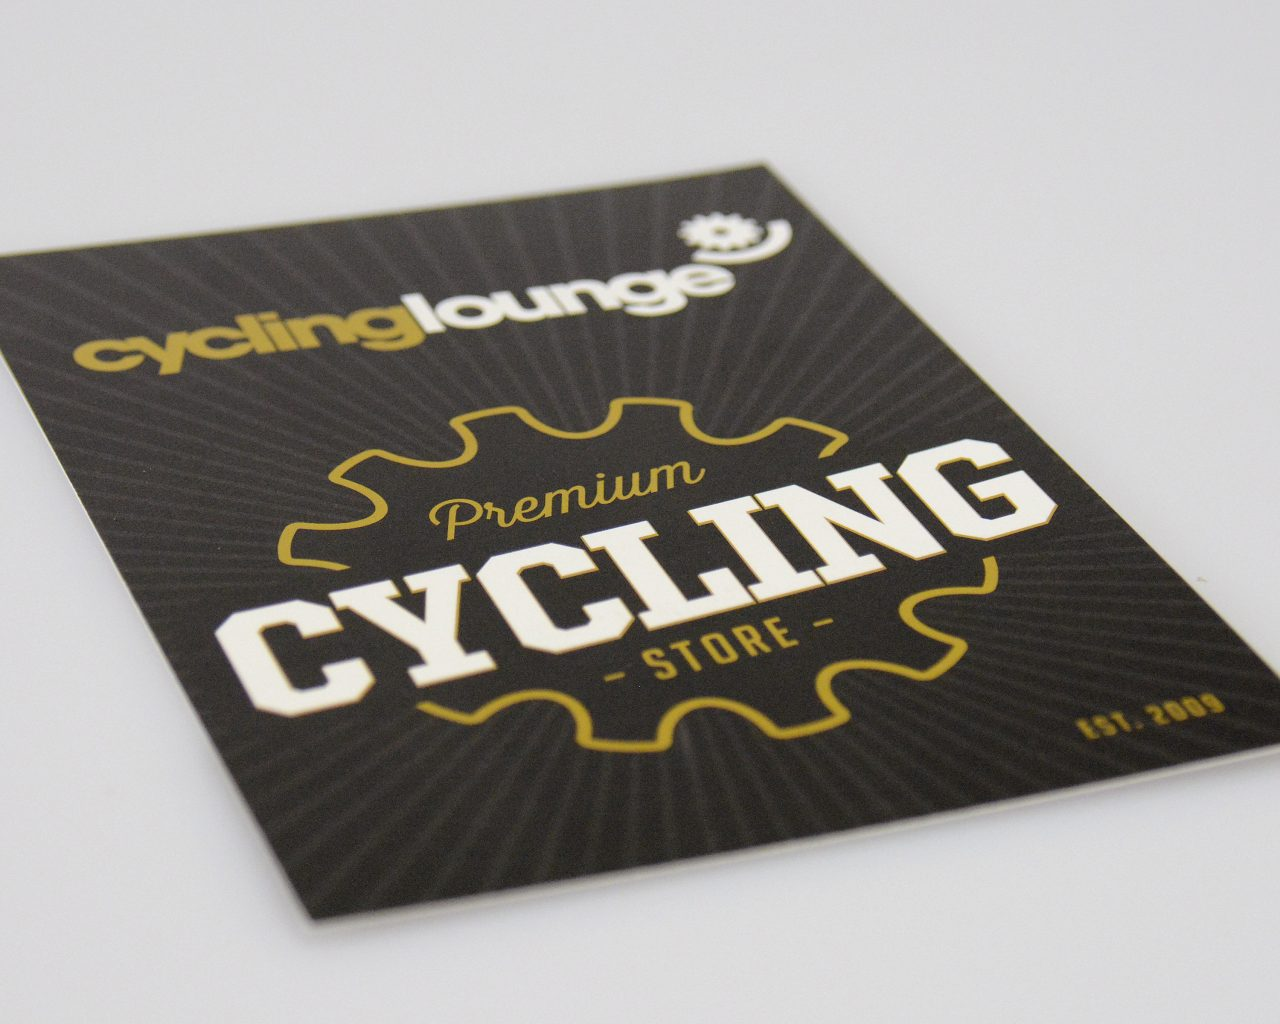 cyclinglonge-01